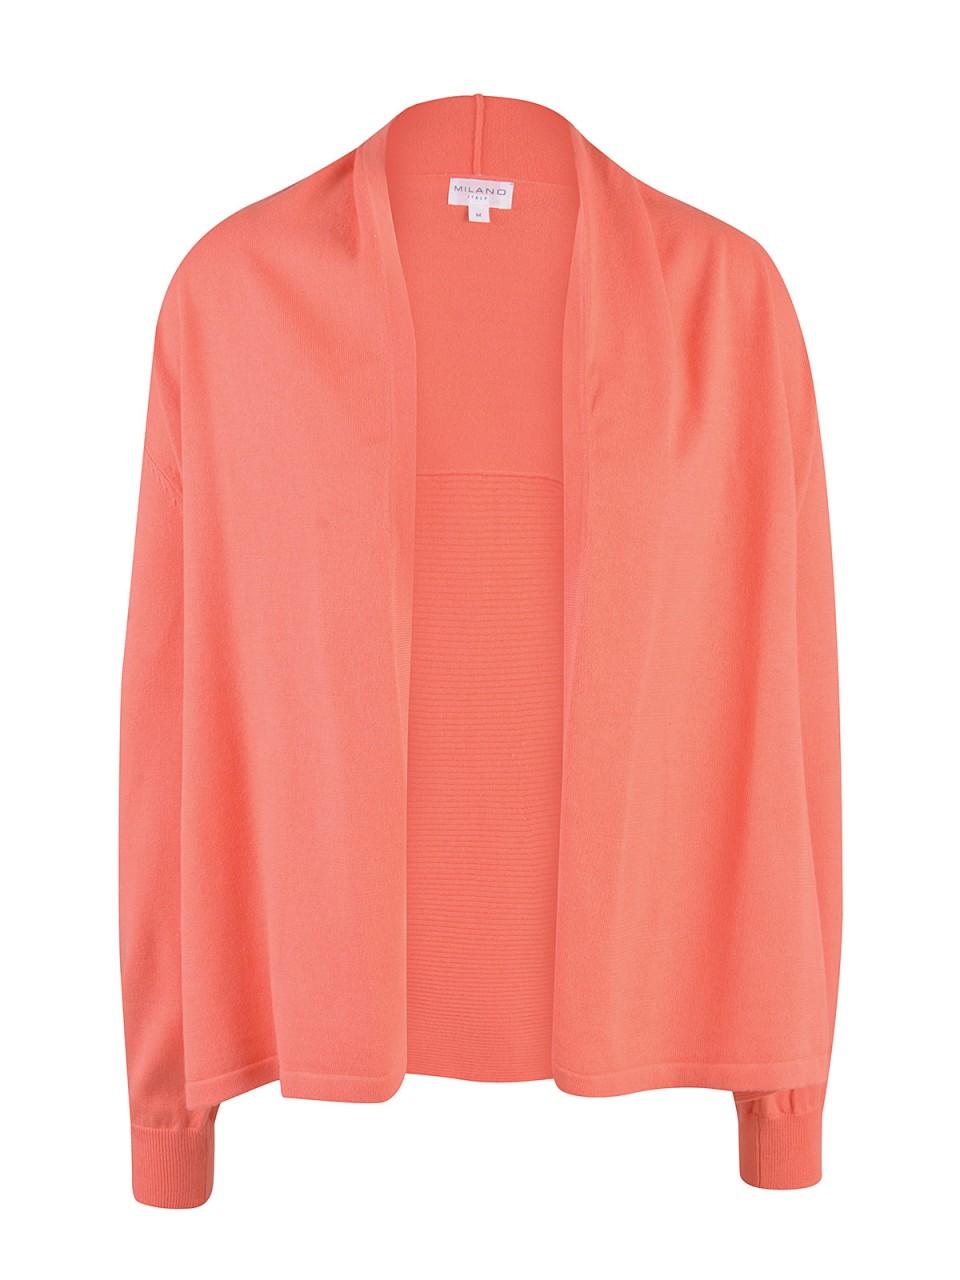 Jacken - MILANO ITALY Damen Cardigan, orange  - Onlineshop Designermode.com